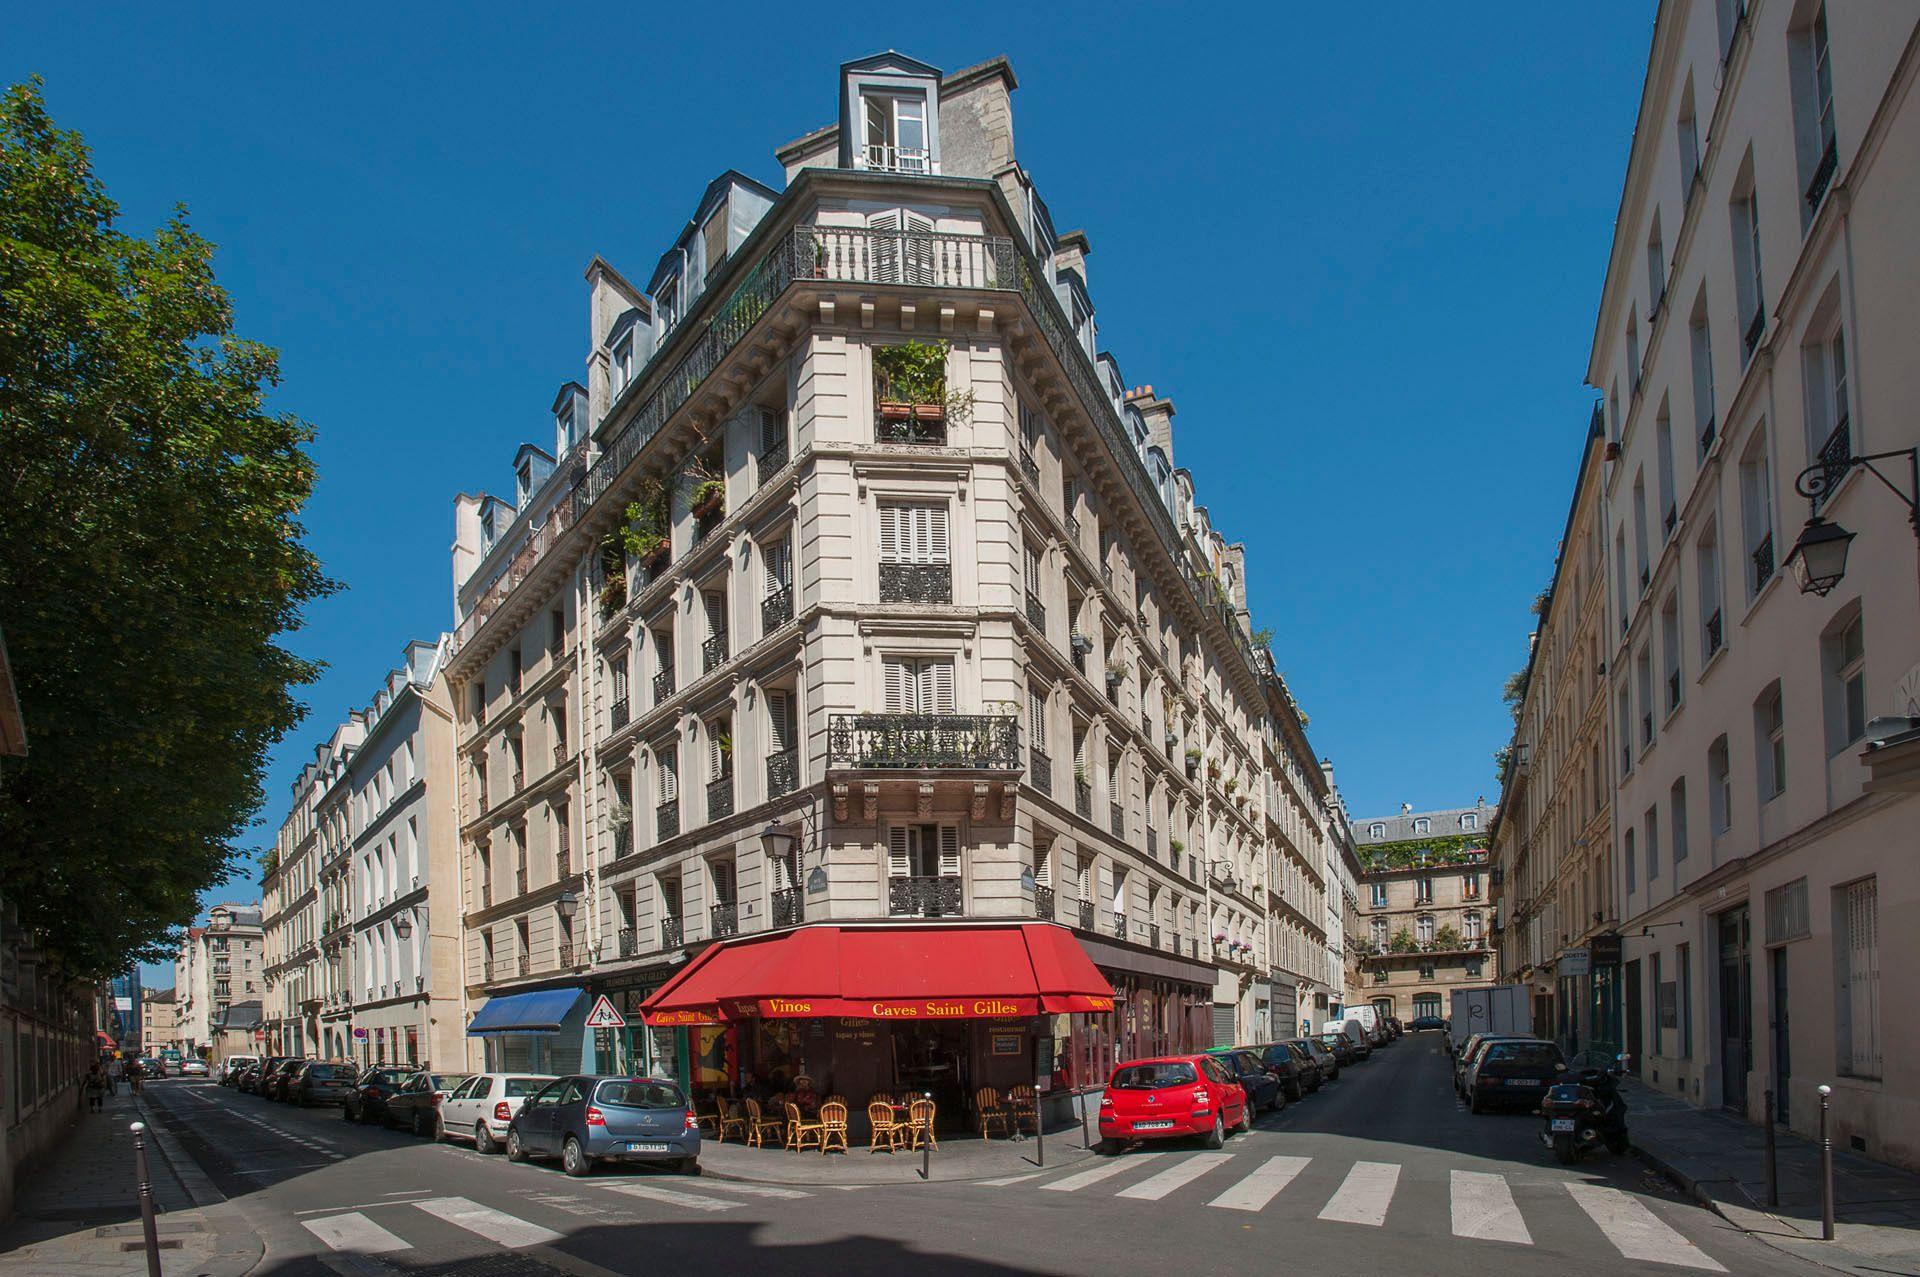 Paris Neighborhood, Le Marais